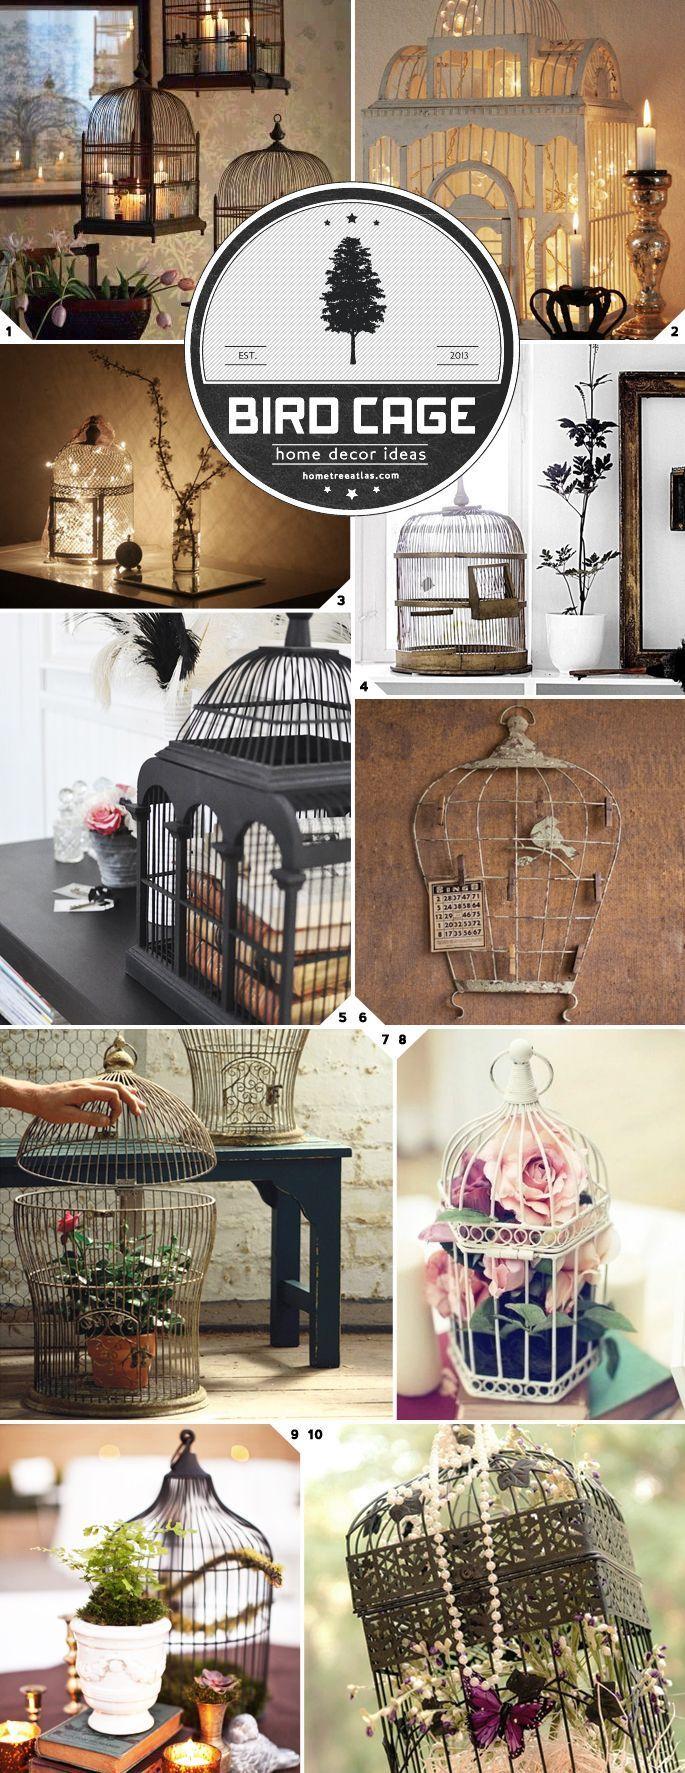 Home Decor Ideas: Using Bird Cages